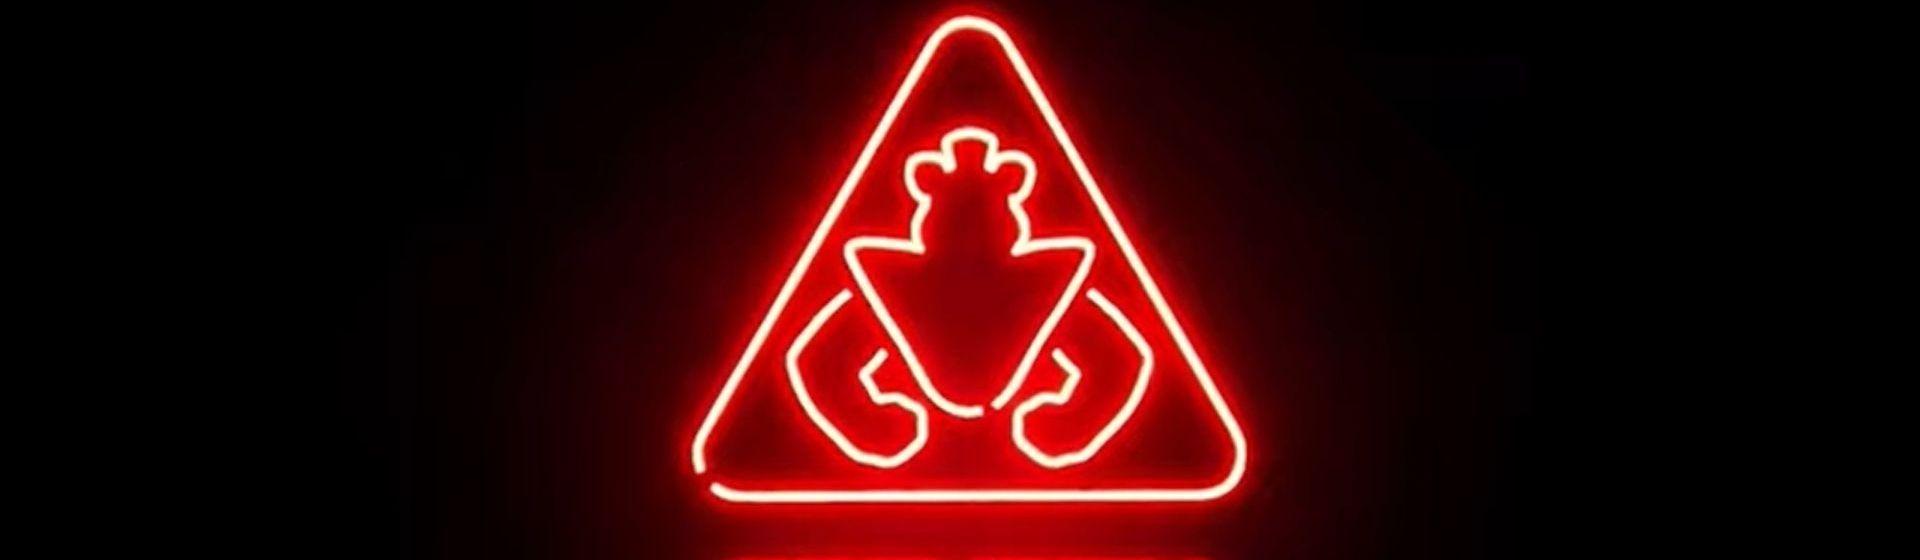 Five Nights at Freddy's é destaque de evento do PlayStation